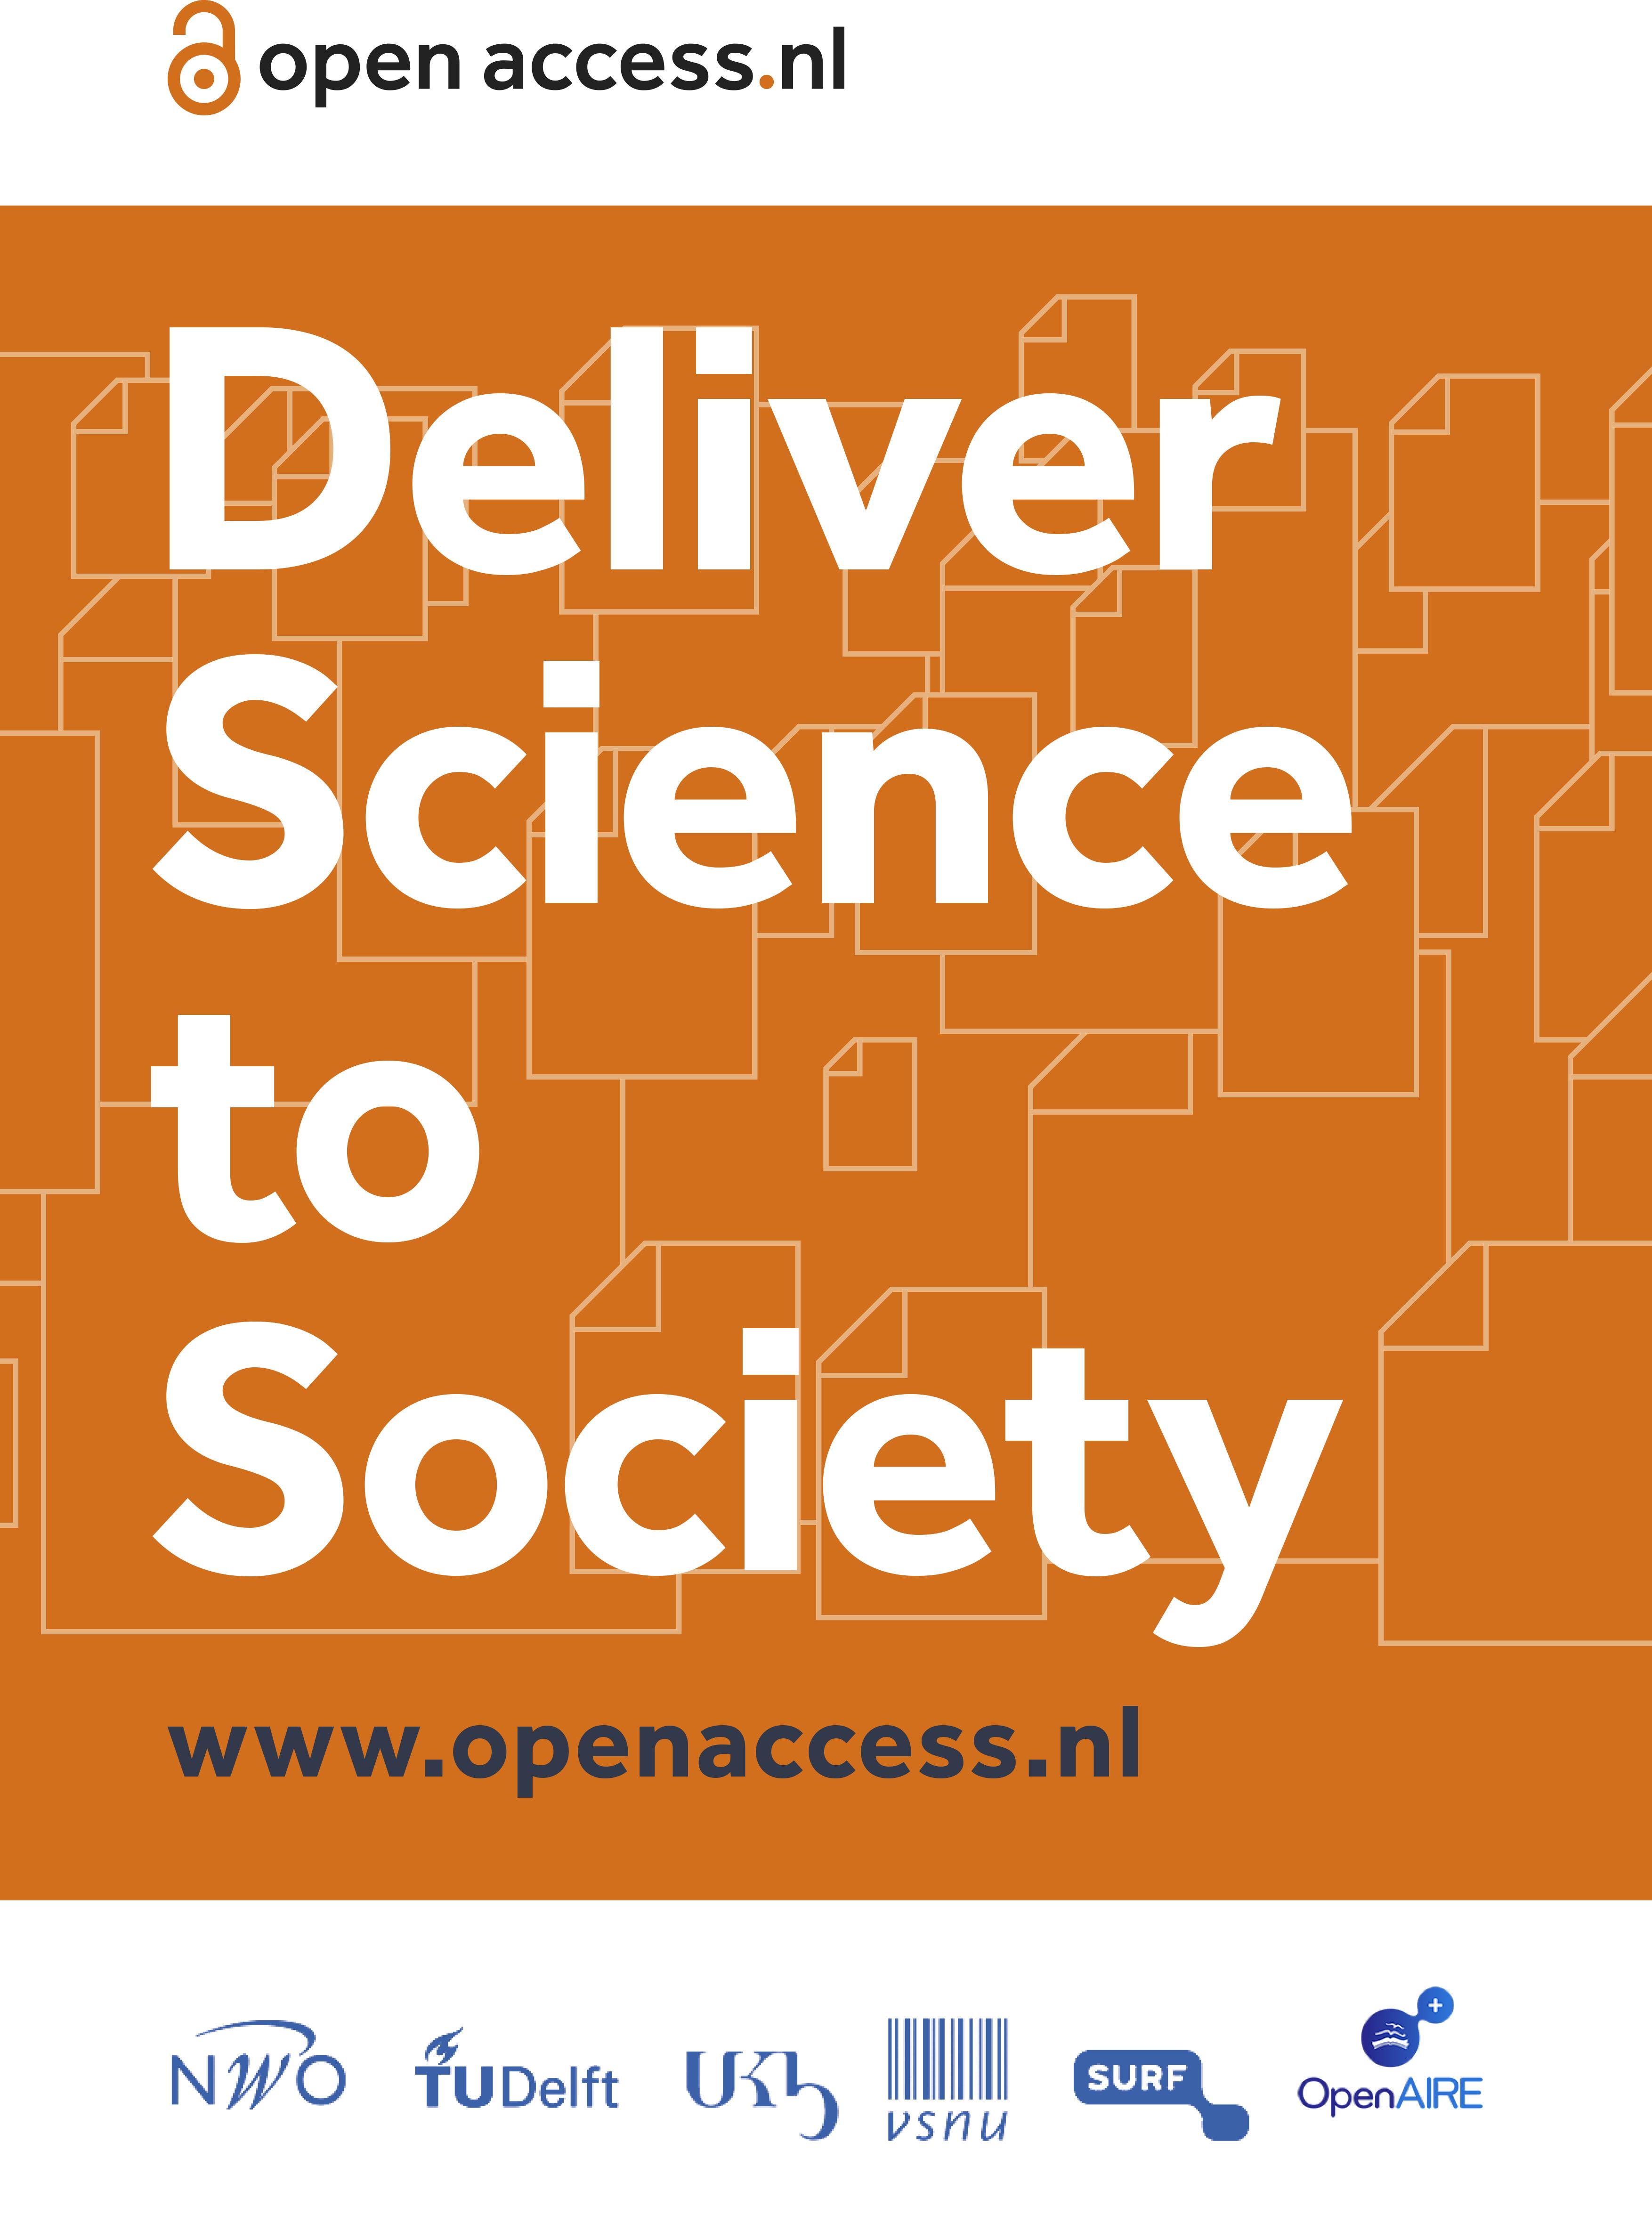 Poster oa.nl